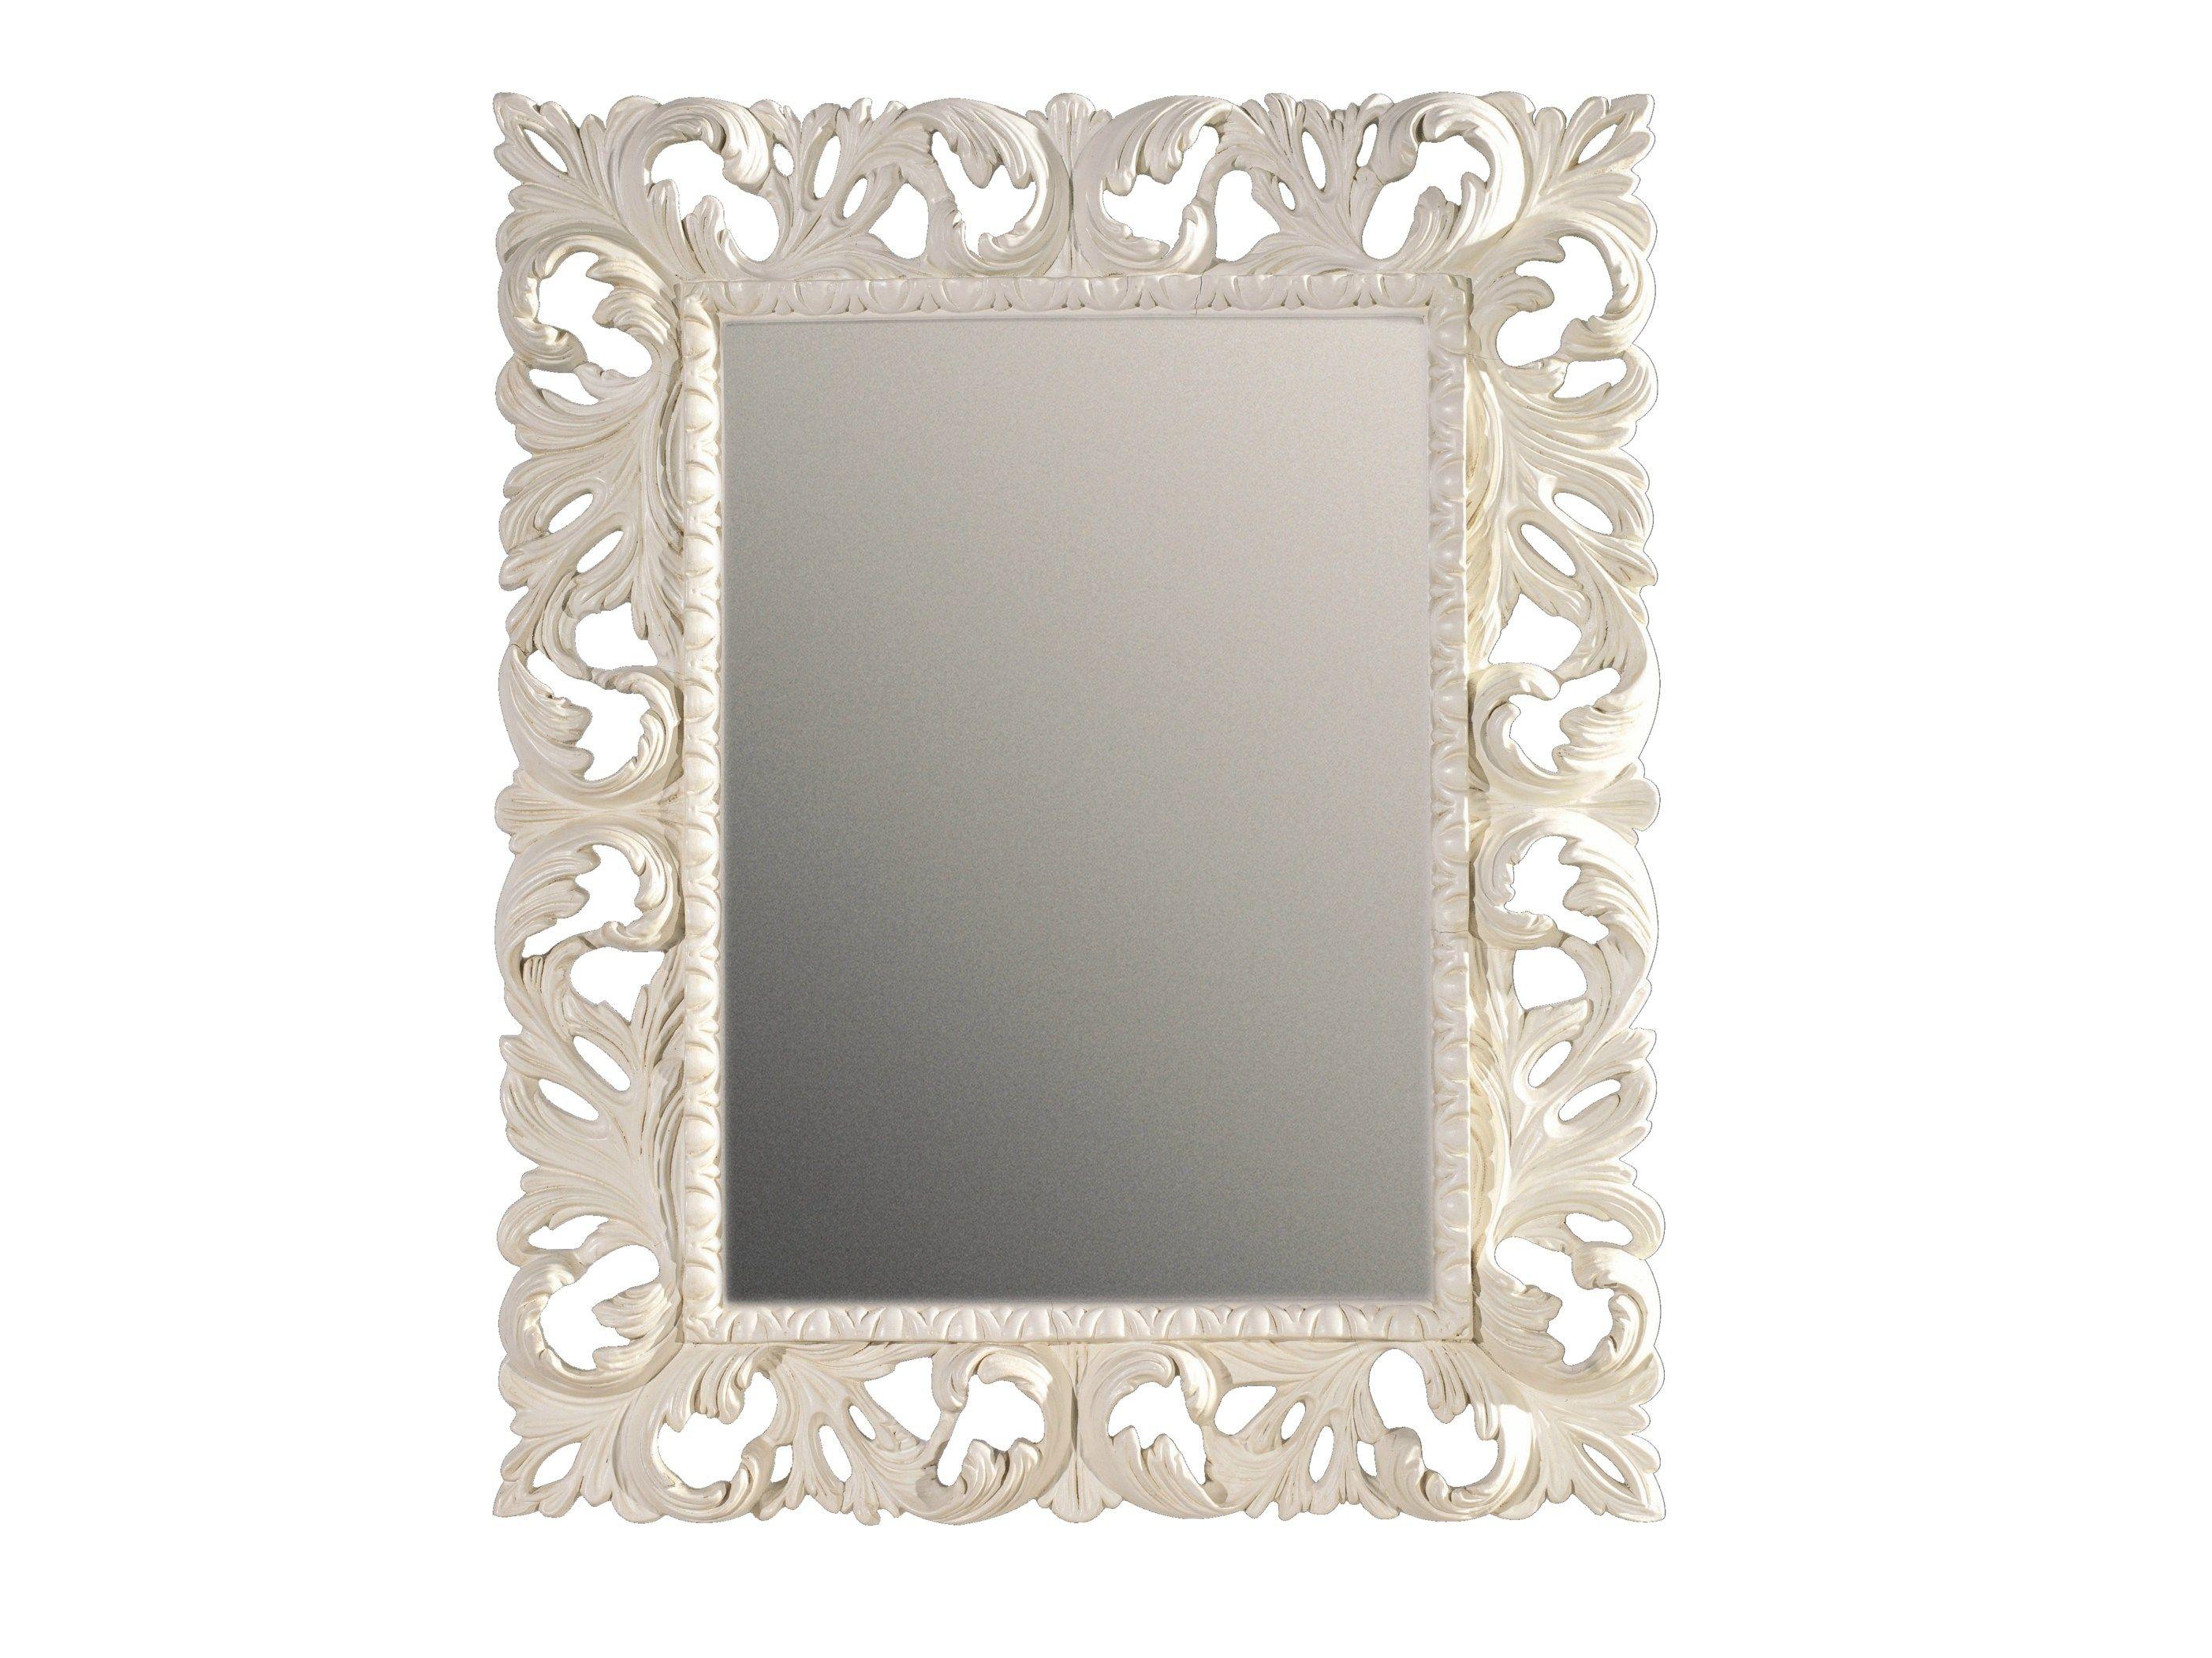 Specchio leroy merlin bagno beautiful lampade specchio bagno leroy merlin u lampadario venice - Specchi da bagno leroy merlin ...